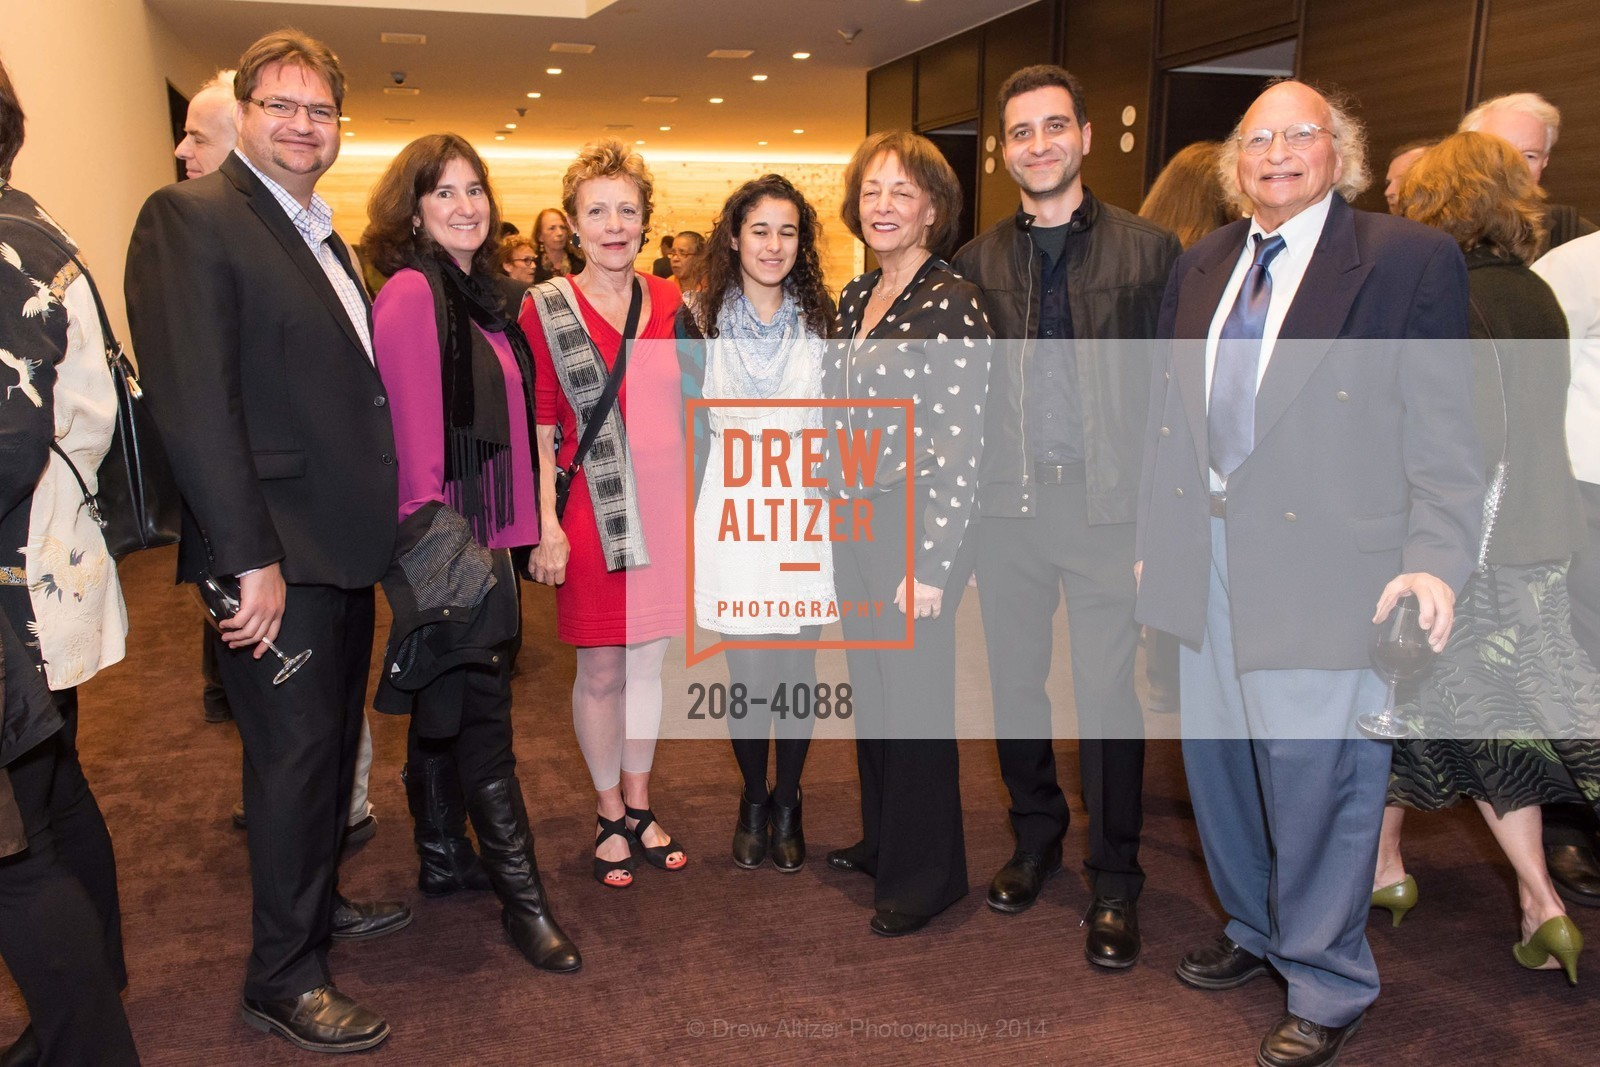 Jessie Roselan, Judy Wise, Ilya Eliashberg, Armin Rosencarnz, Photo #208-4088